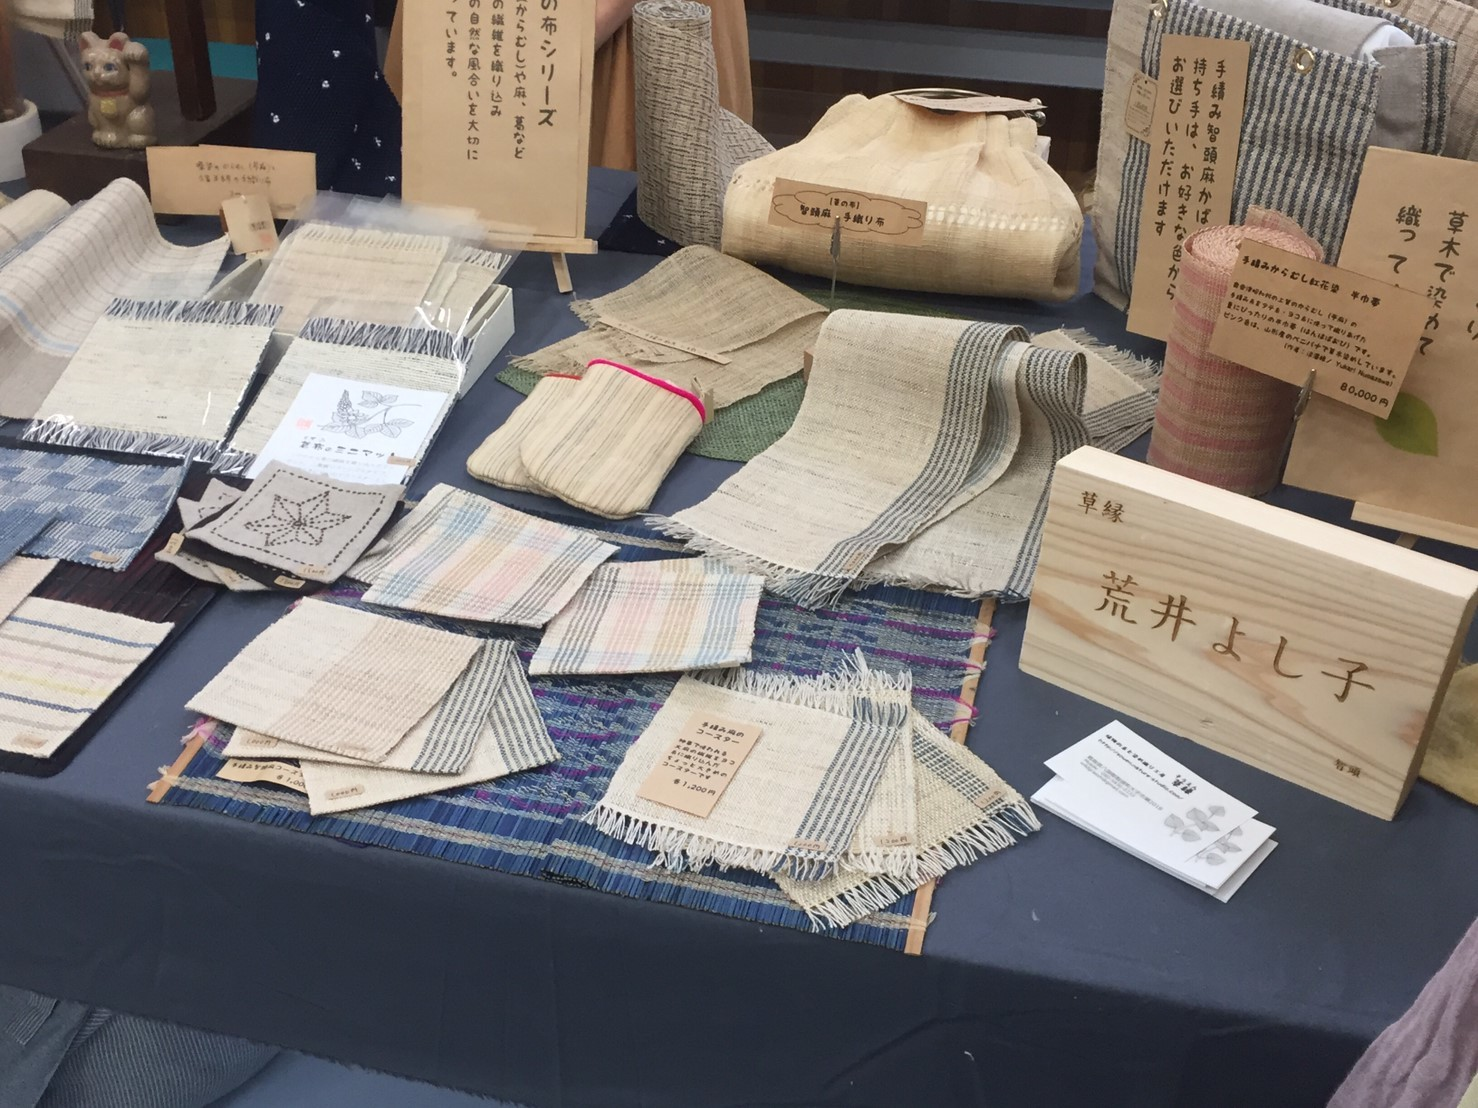 西郷工芸祭り・三滝渓_e0115904_16225664.jpg